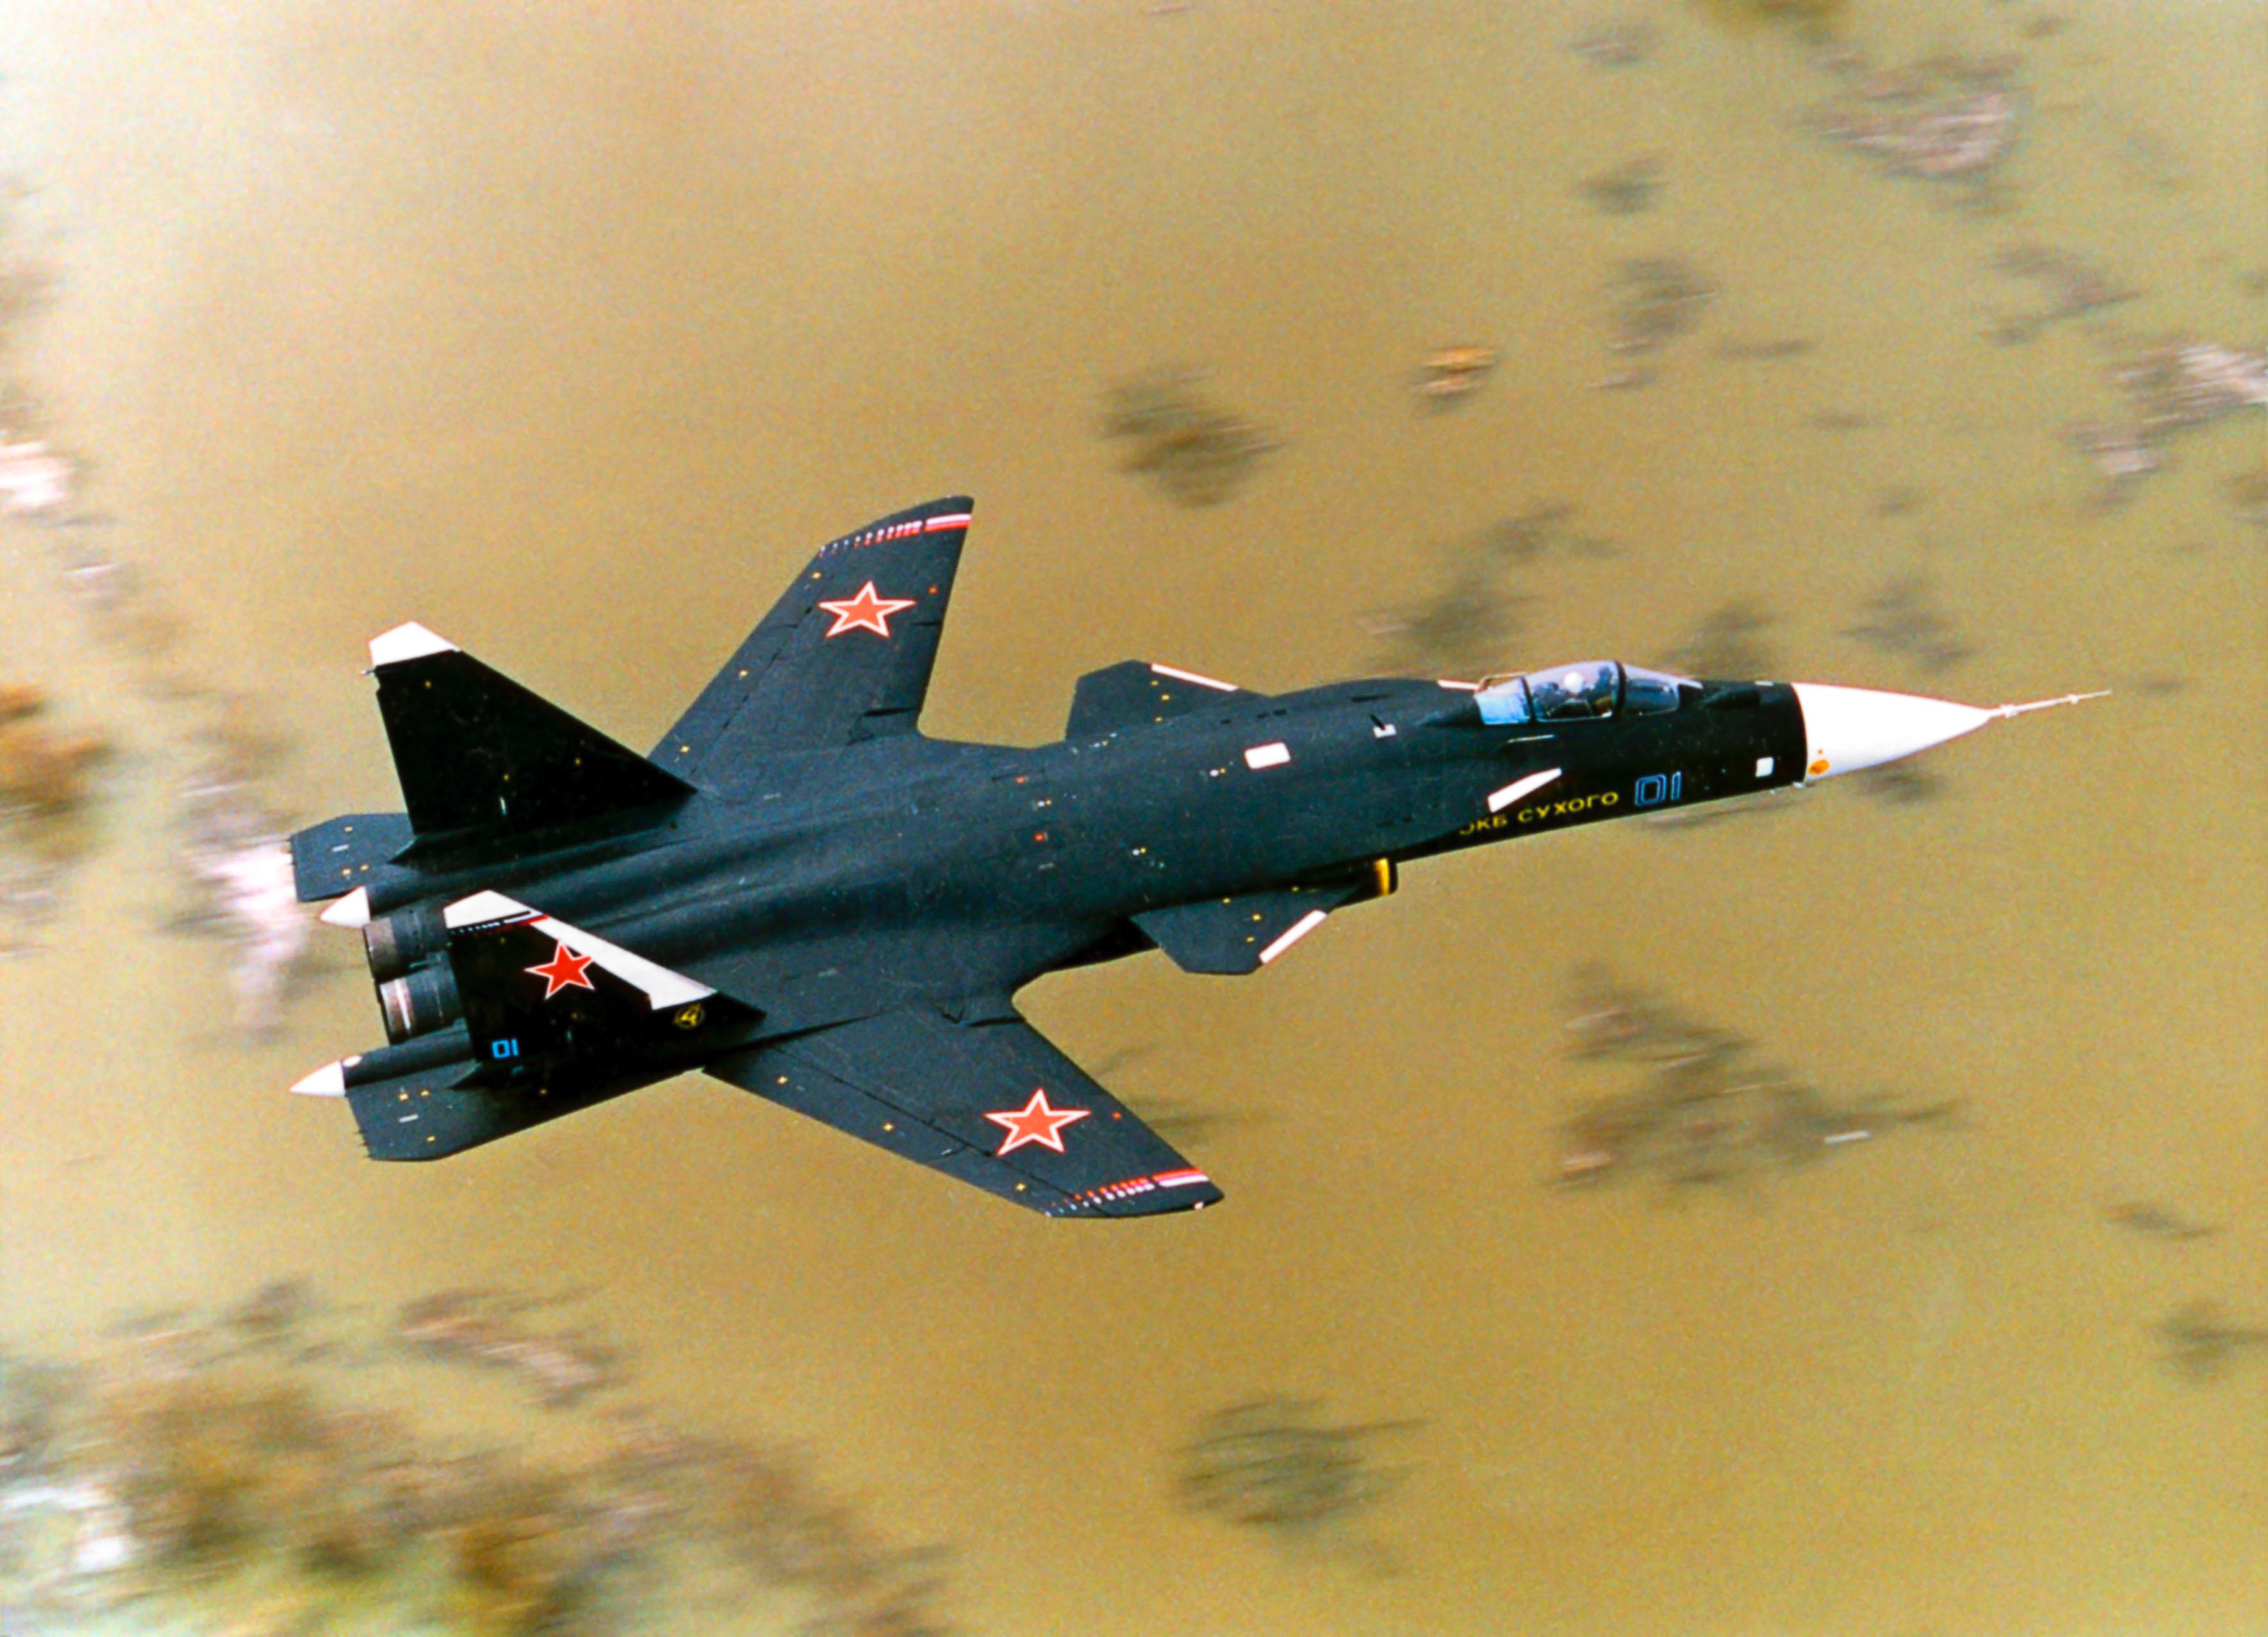 Little Fighter Plane beththe 190709072126-sukhoi-su-47-restricted